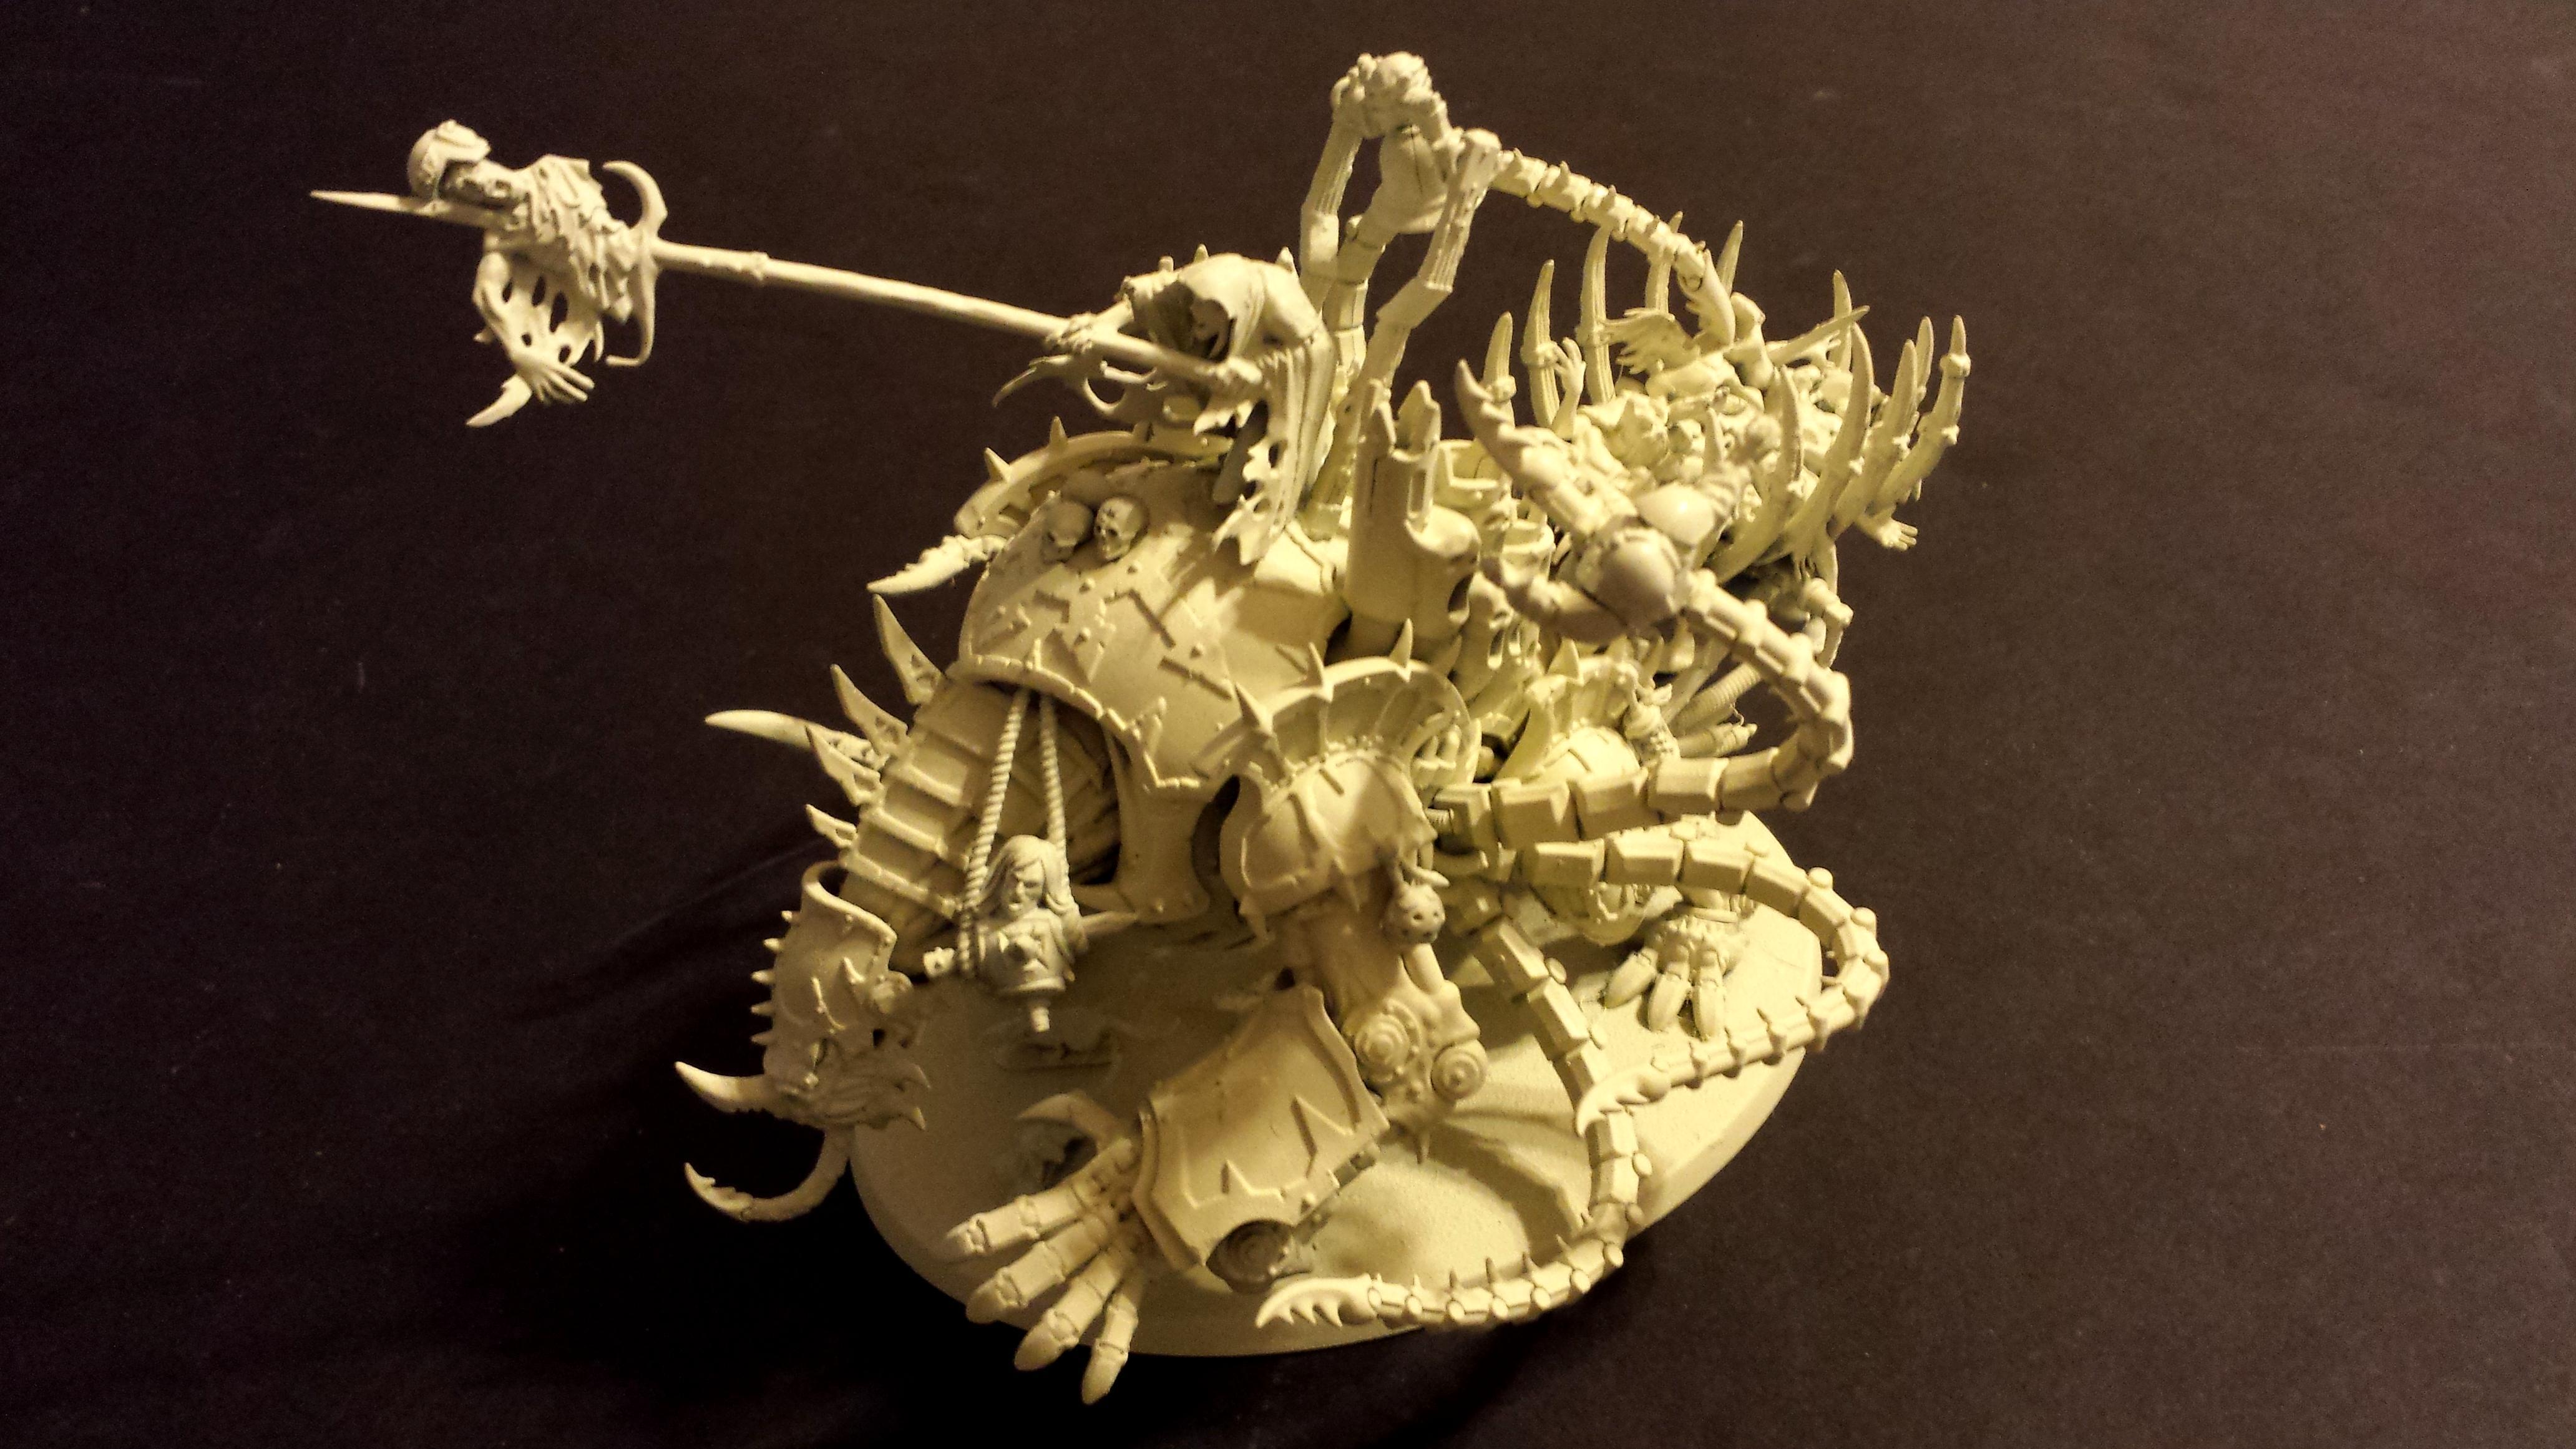 Nurgle Mauler Fiend, Mauler fiend with corpse cart